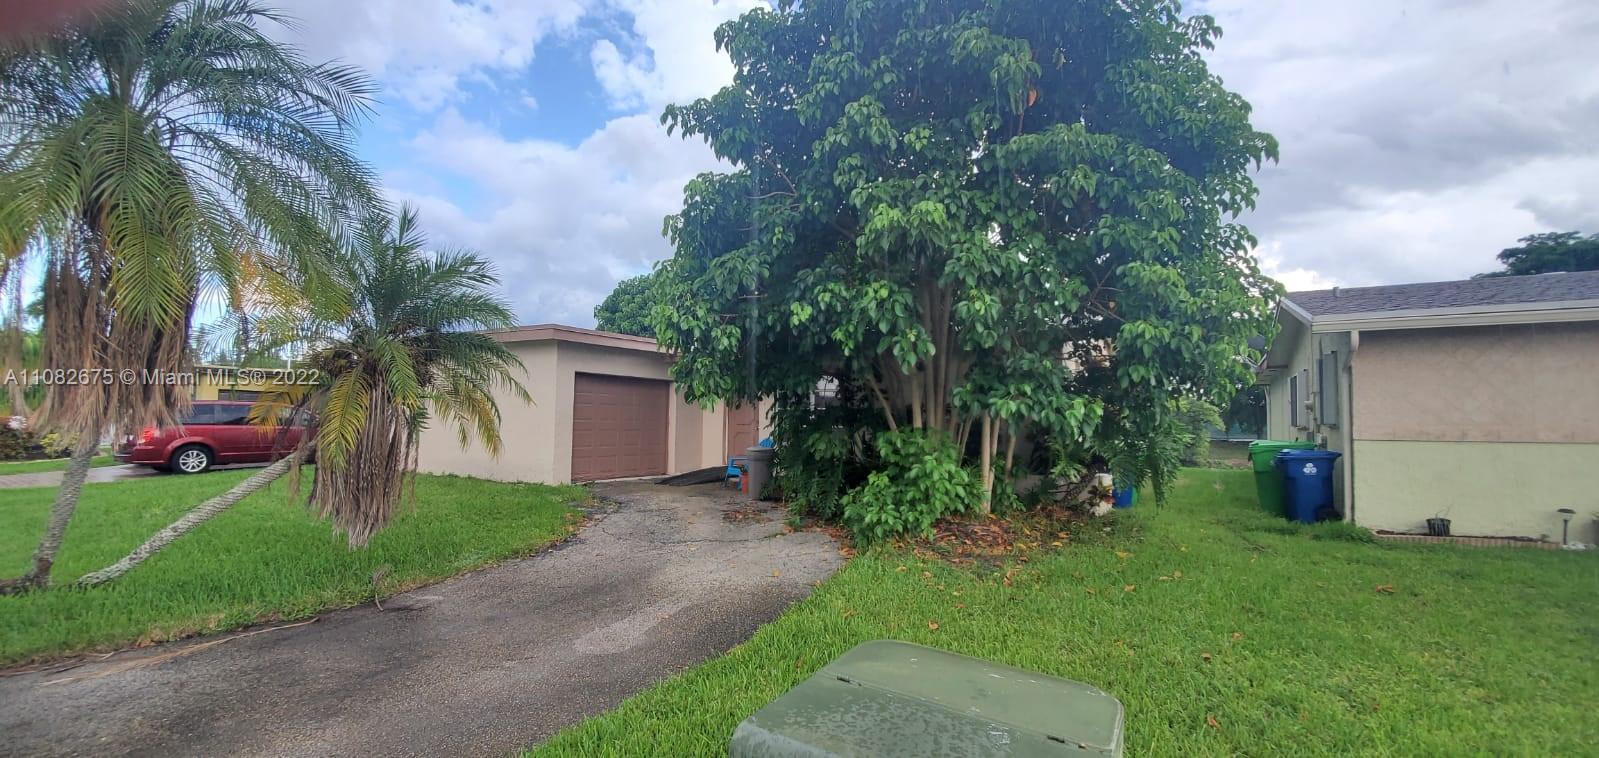 Sunrise Golf Village - 11390 NW 45th Pl, Sunrise, FL 33323